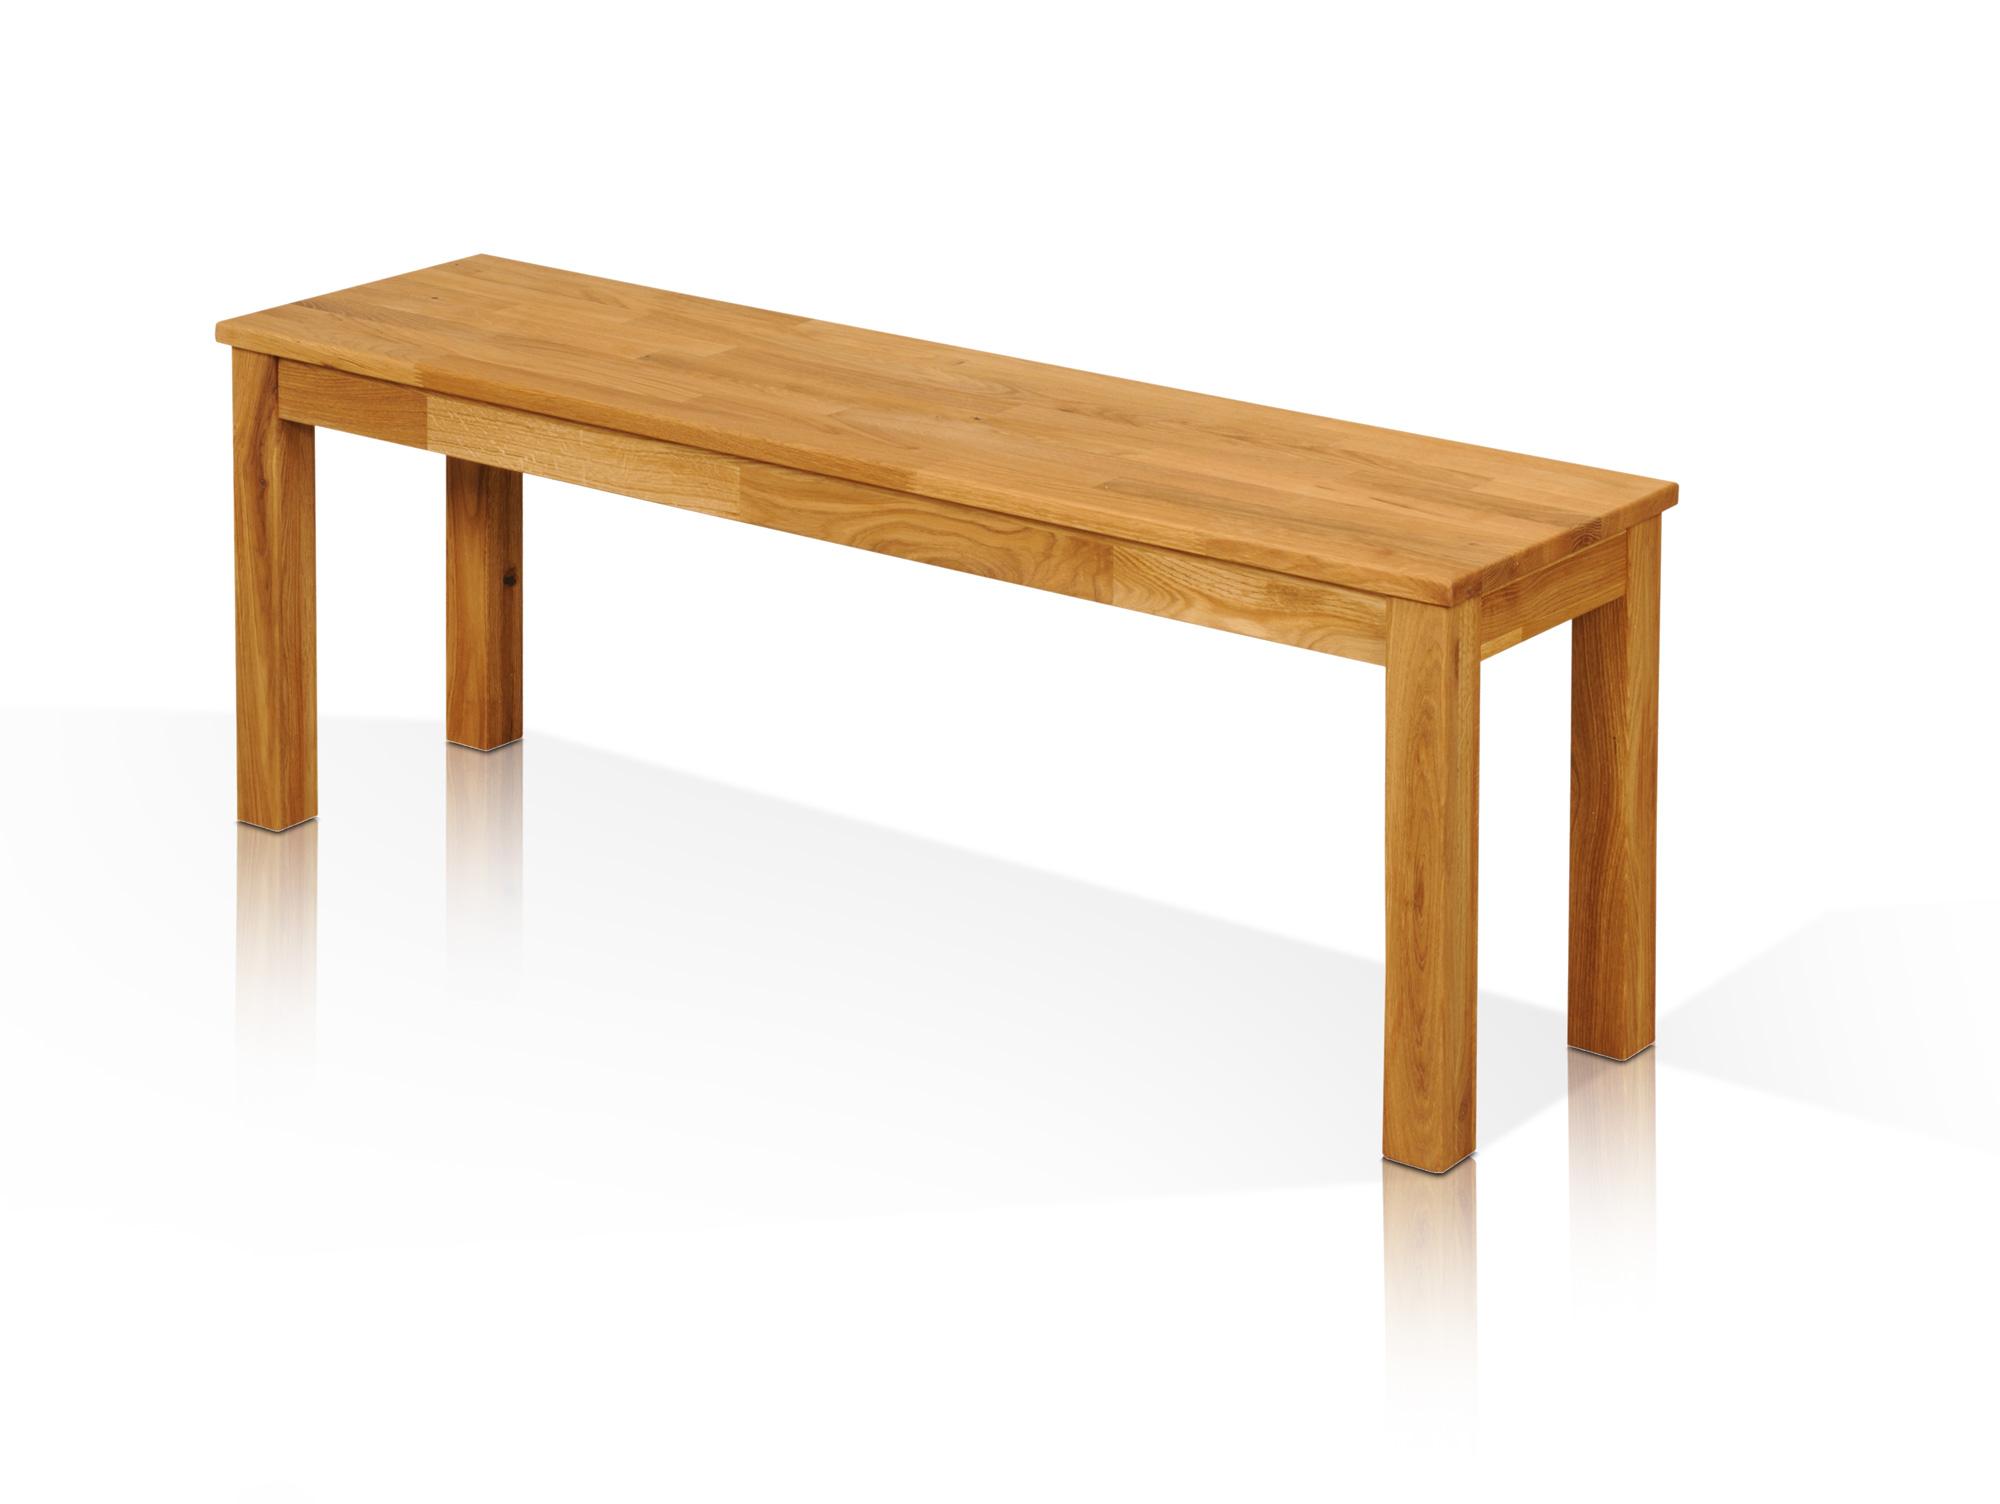 anna sitzbank wildeiche ge lt 180 cm. Black Bedroom Furniture Sets. Home Design Ideas